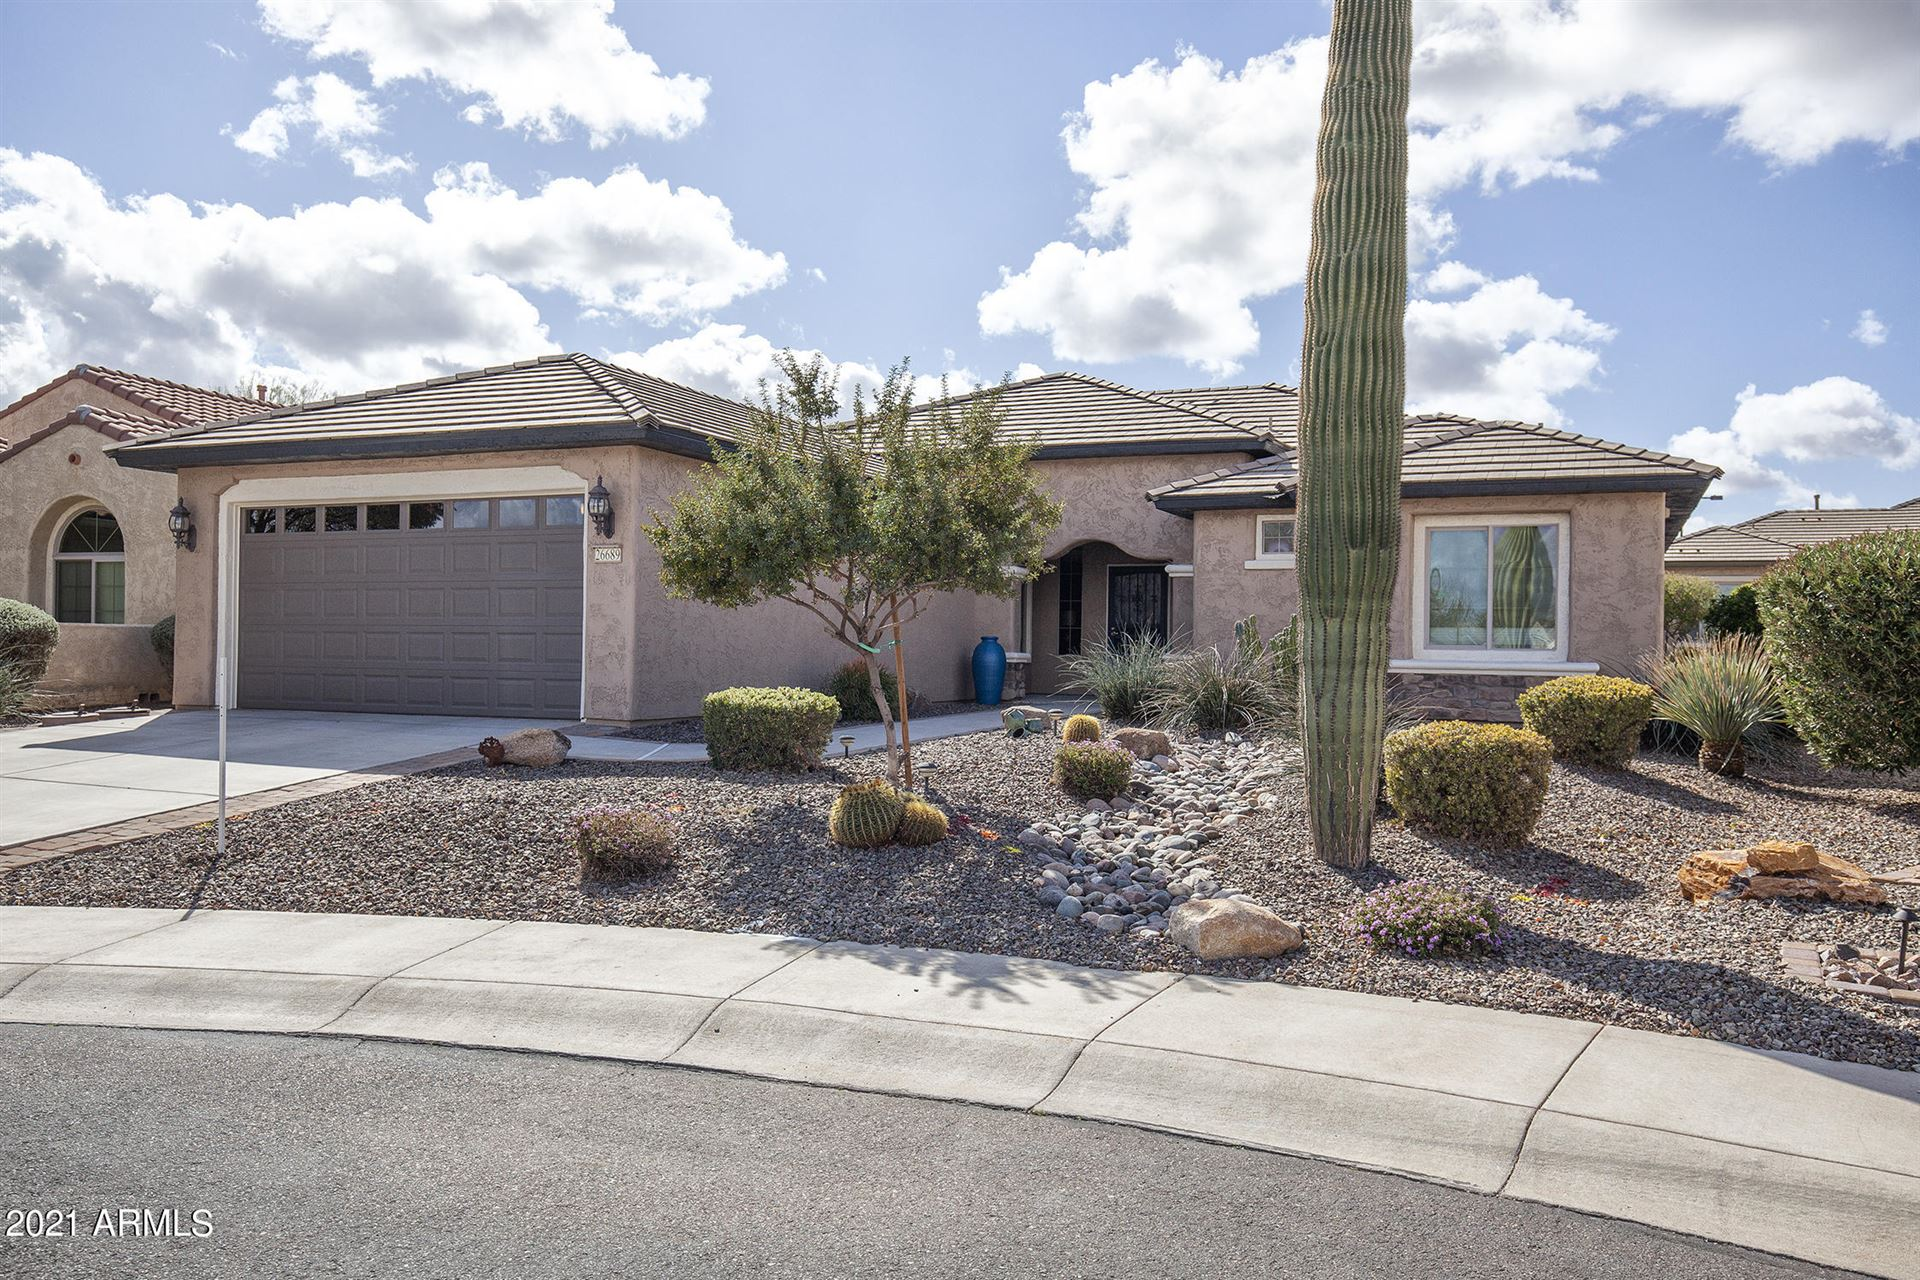 Photo of 26689 W BURNETT Road, Buckeye, AZ 85396 (MLS # 6202869)